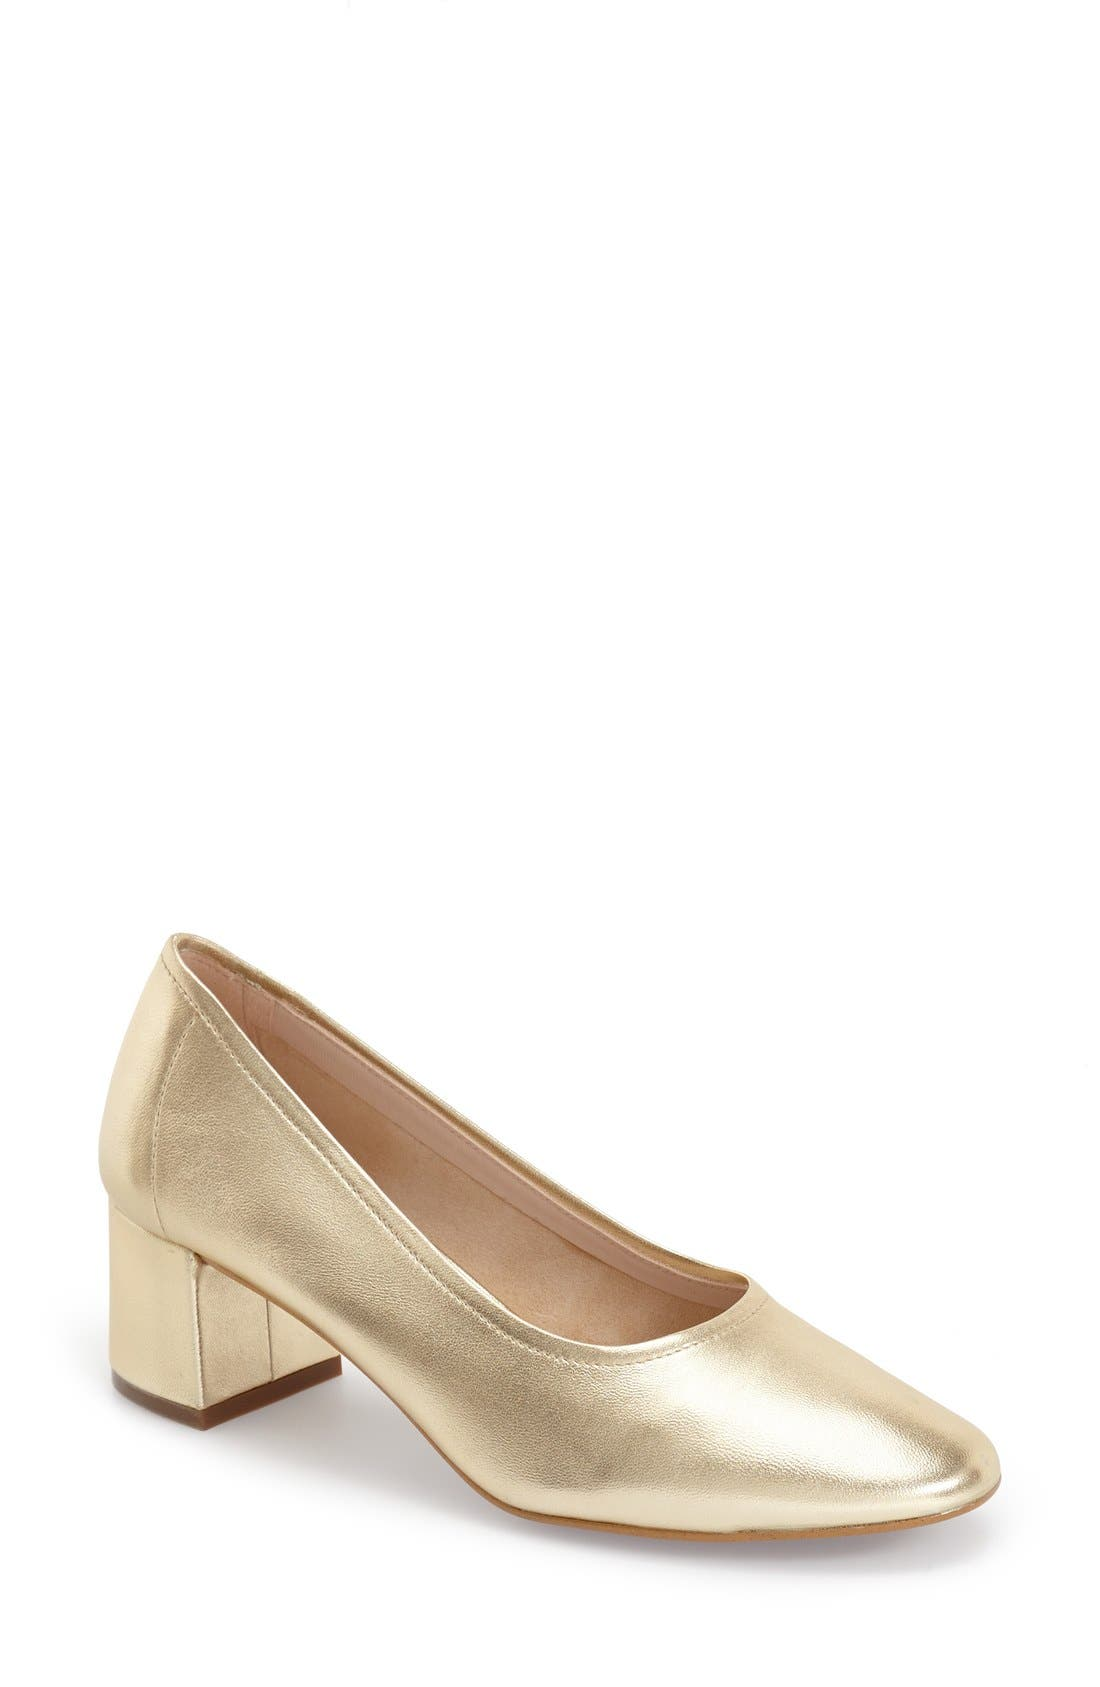 'Juno' Ballet Shoe,                         Main,                         color, Gold